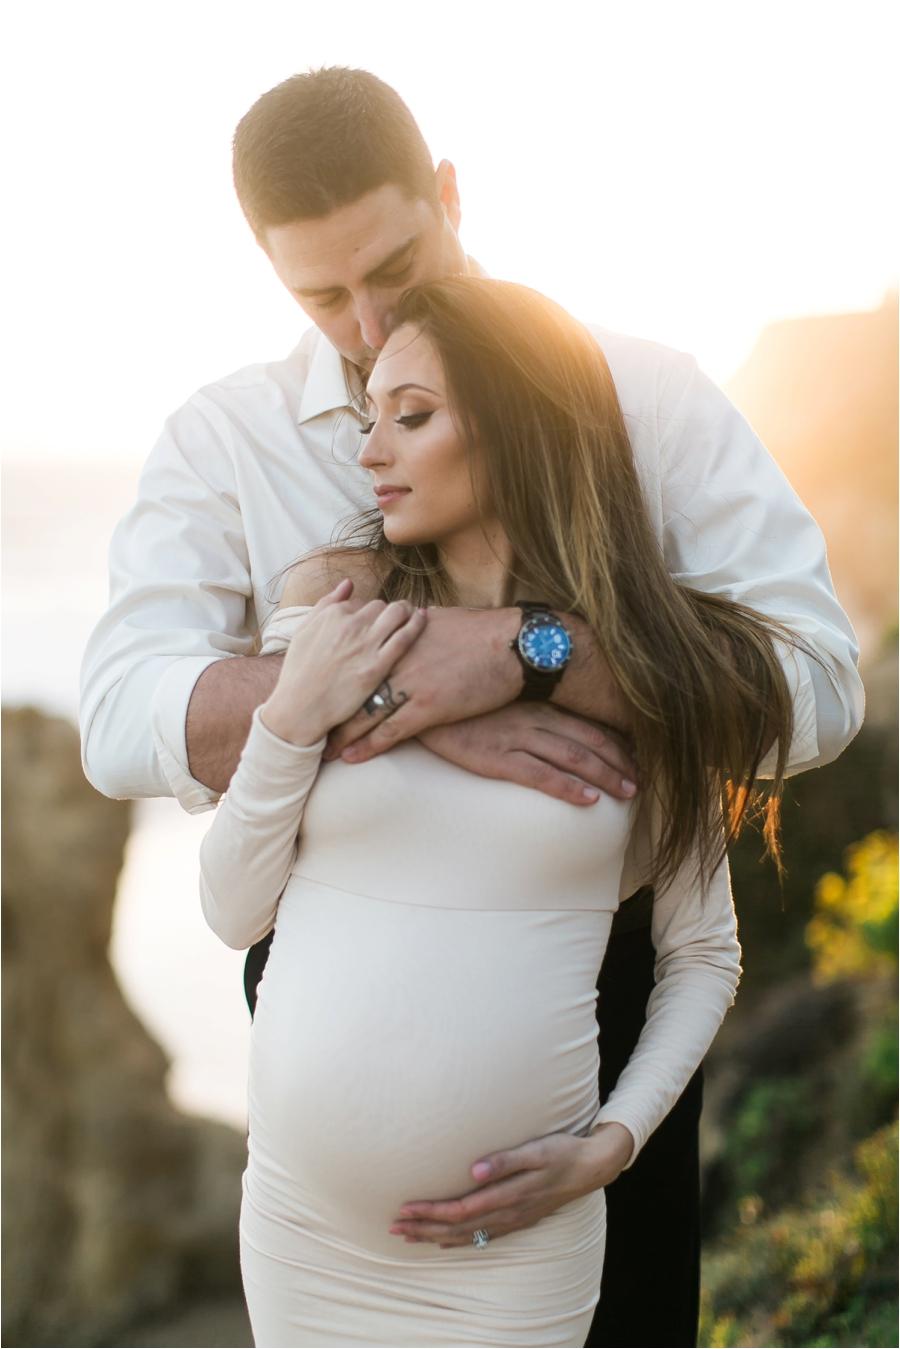 los-angeles-maternity-photographer-sew-trendy-accessories_1175.jpg